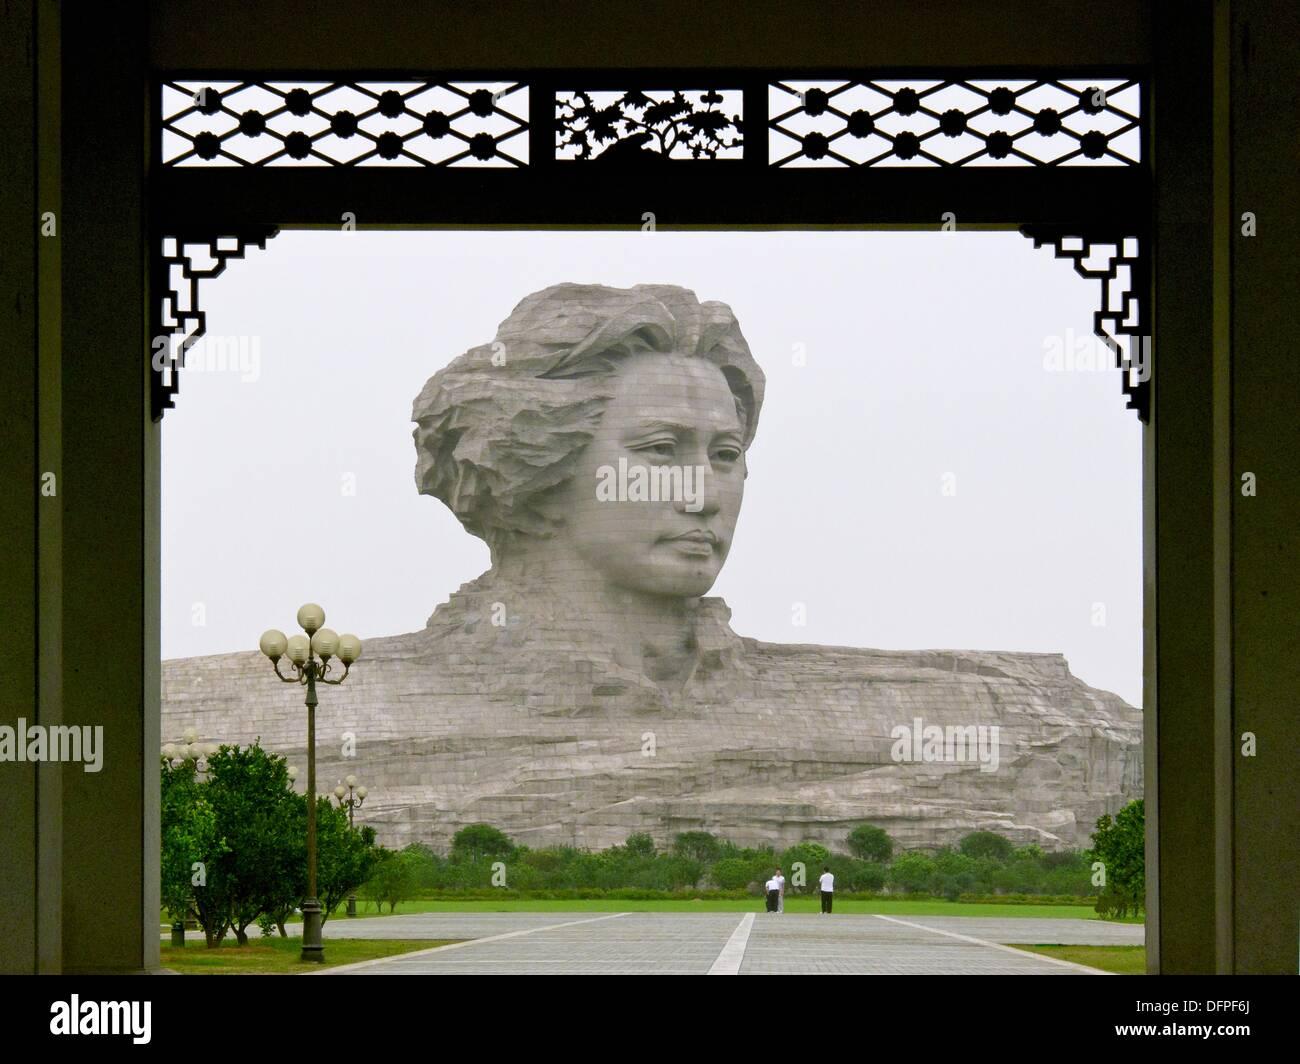 Vorsitzender Mao jugendlich Skulptur sehen Orange Island, Changsha, Hunan, China. Stockbild